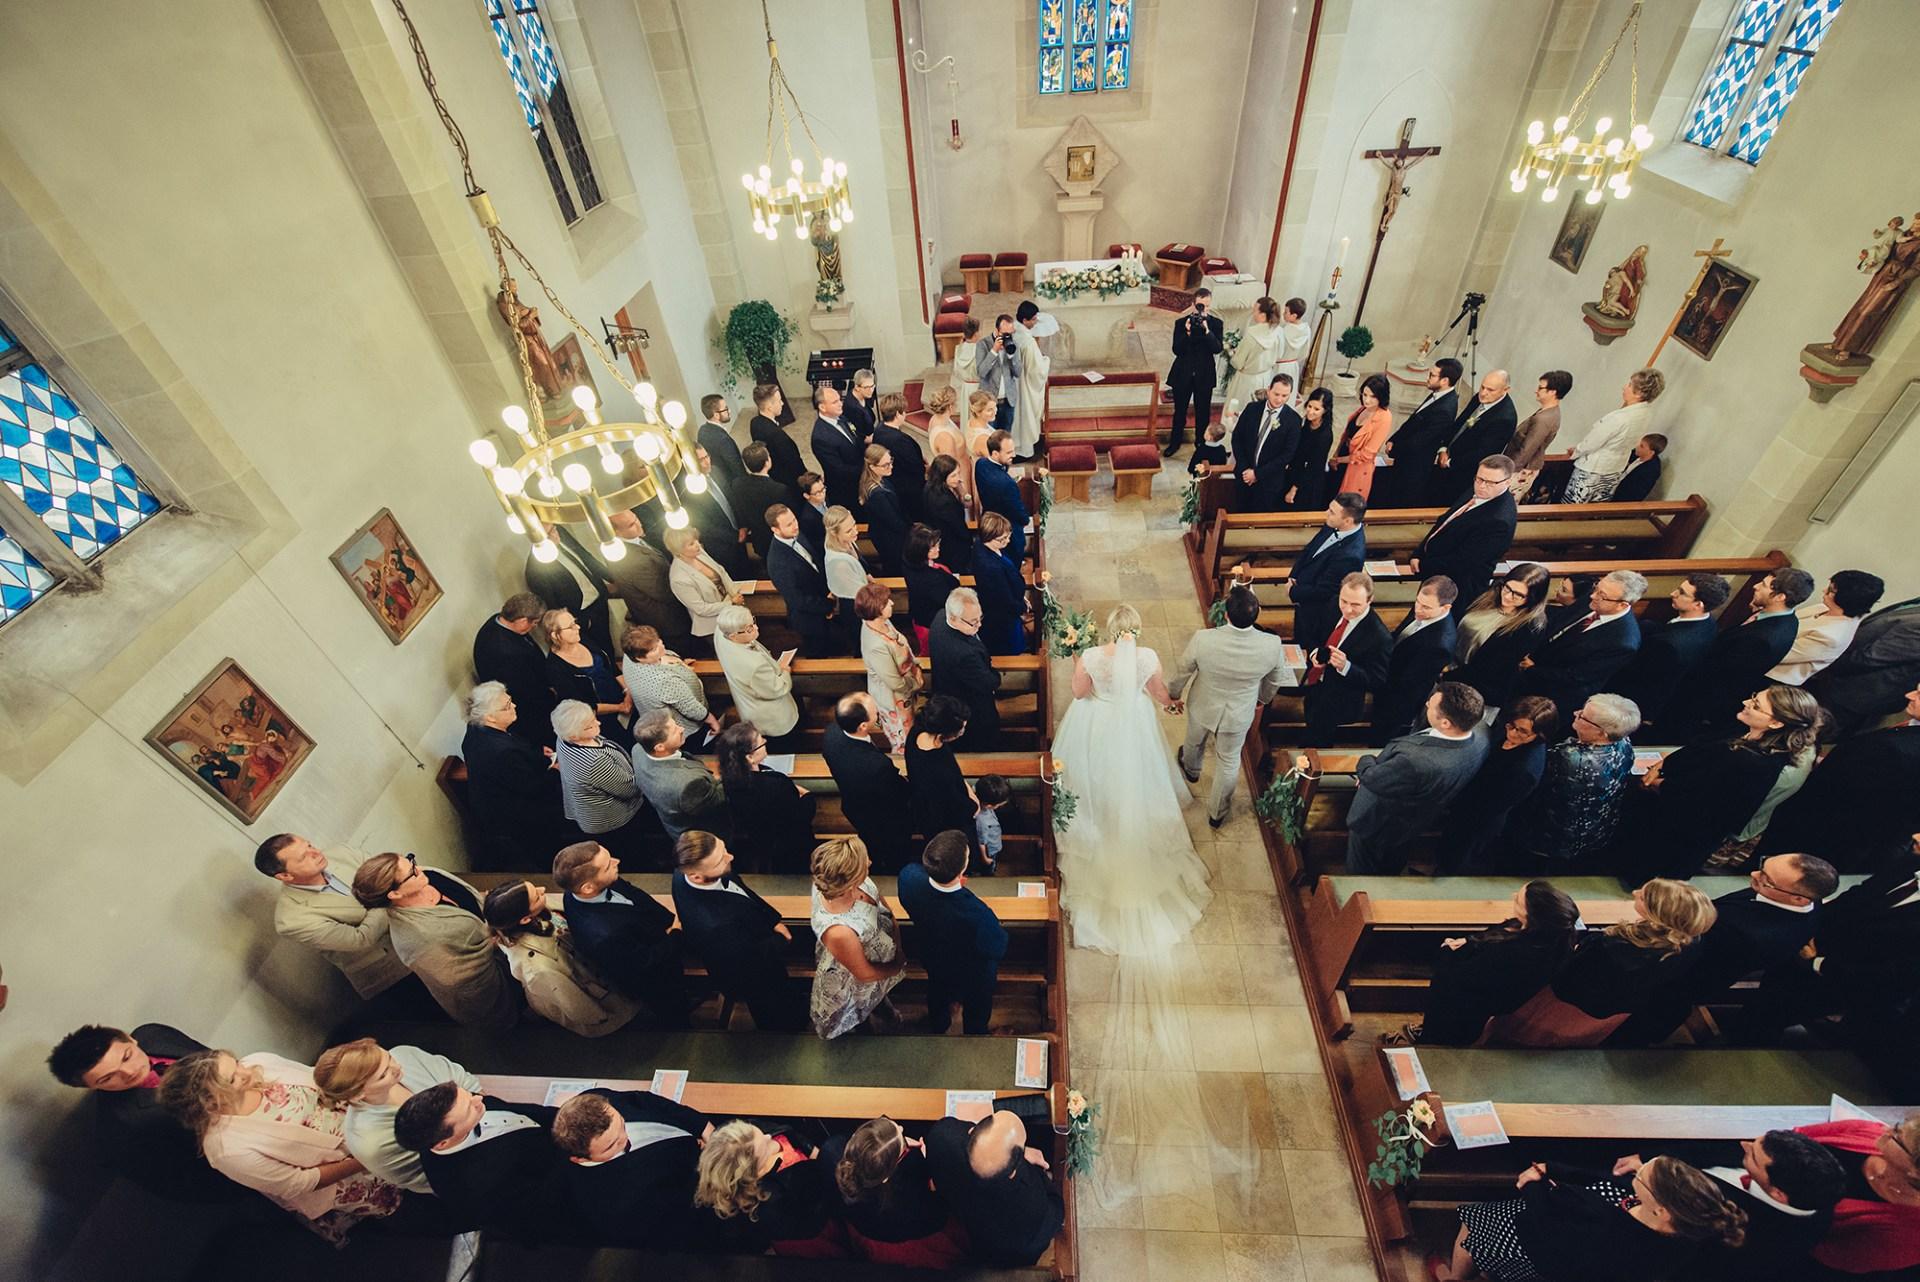 weddingseptemberluminoxx92348234022